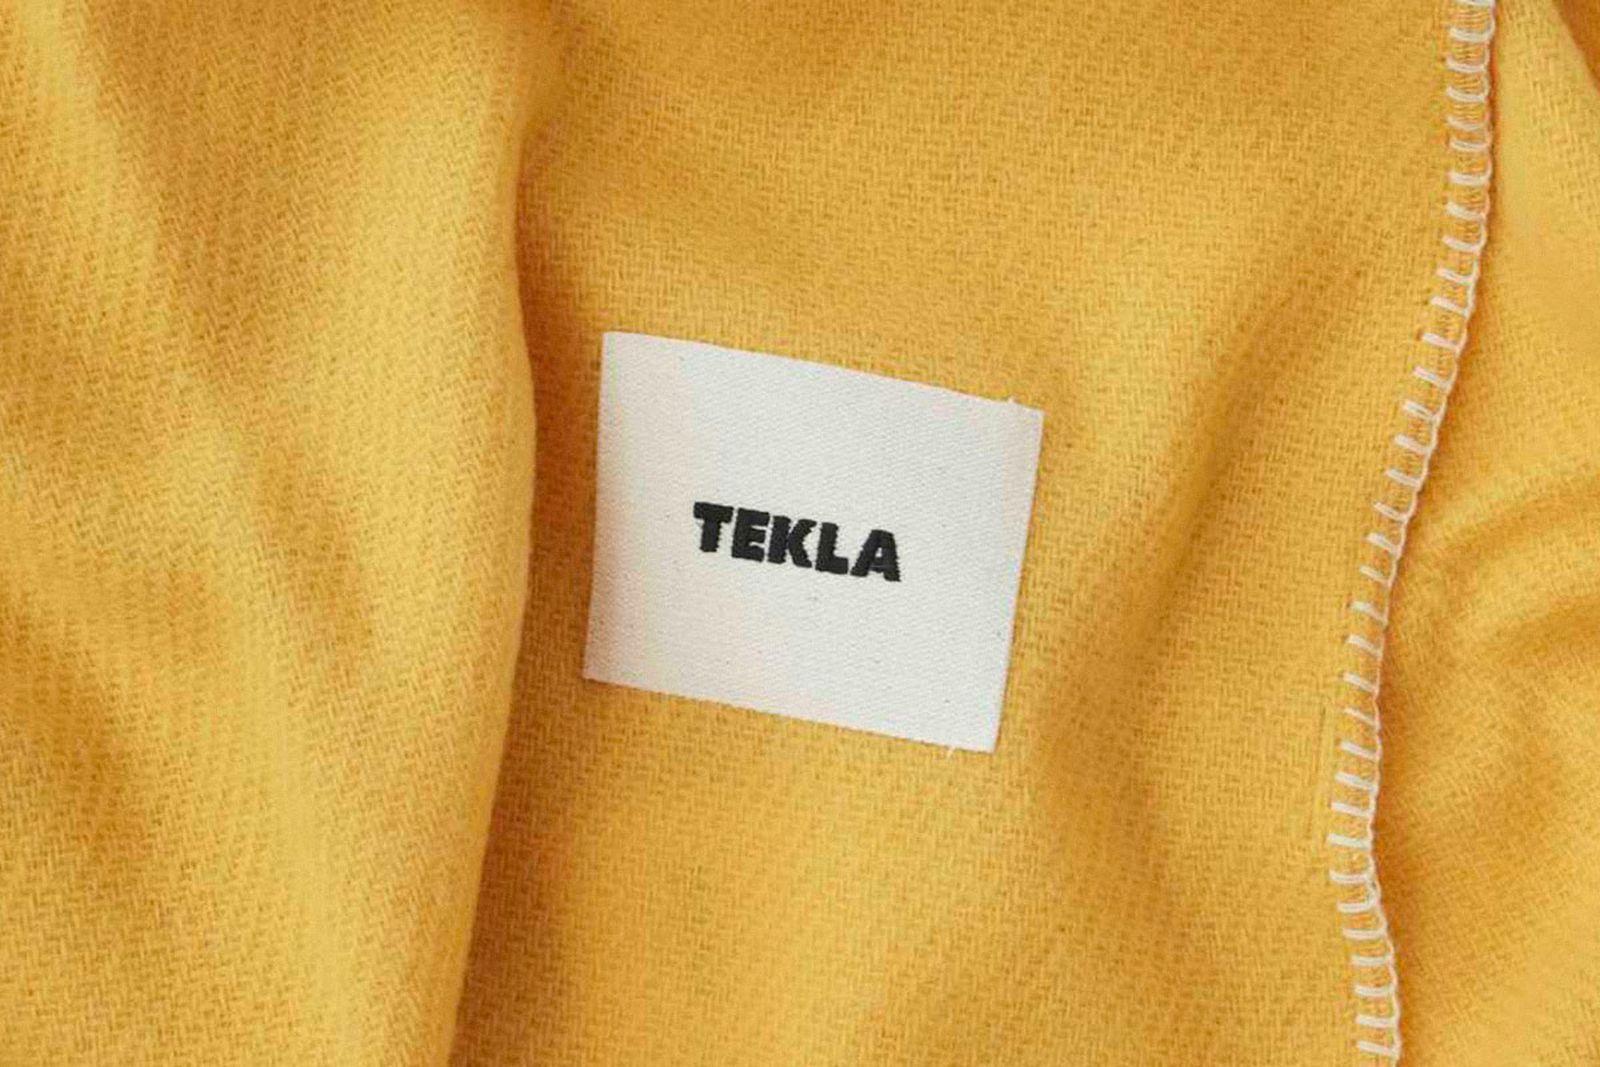 tekla-ssense-main